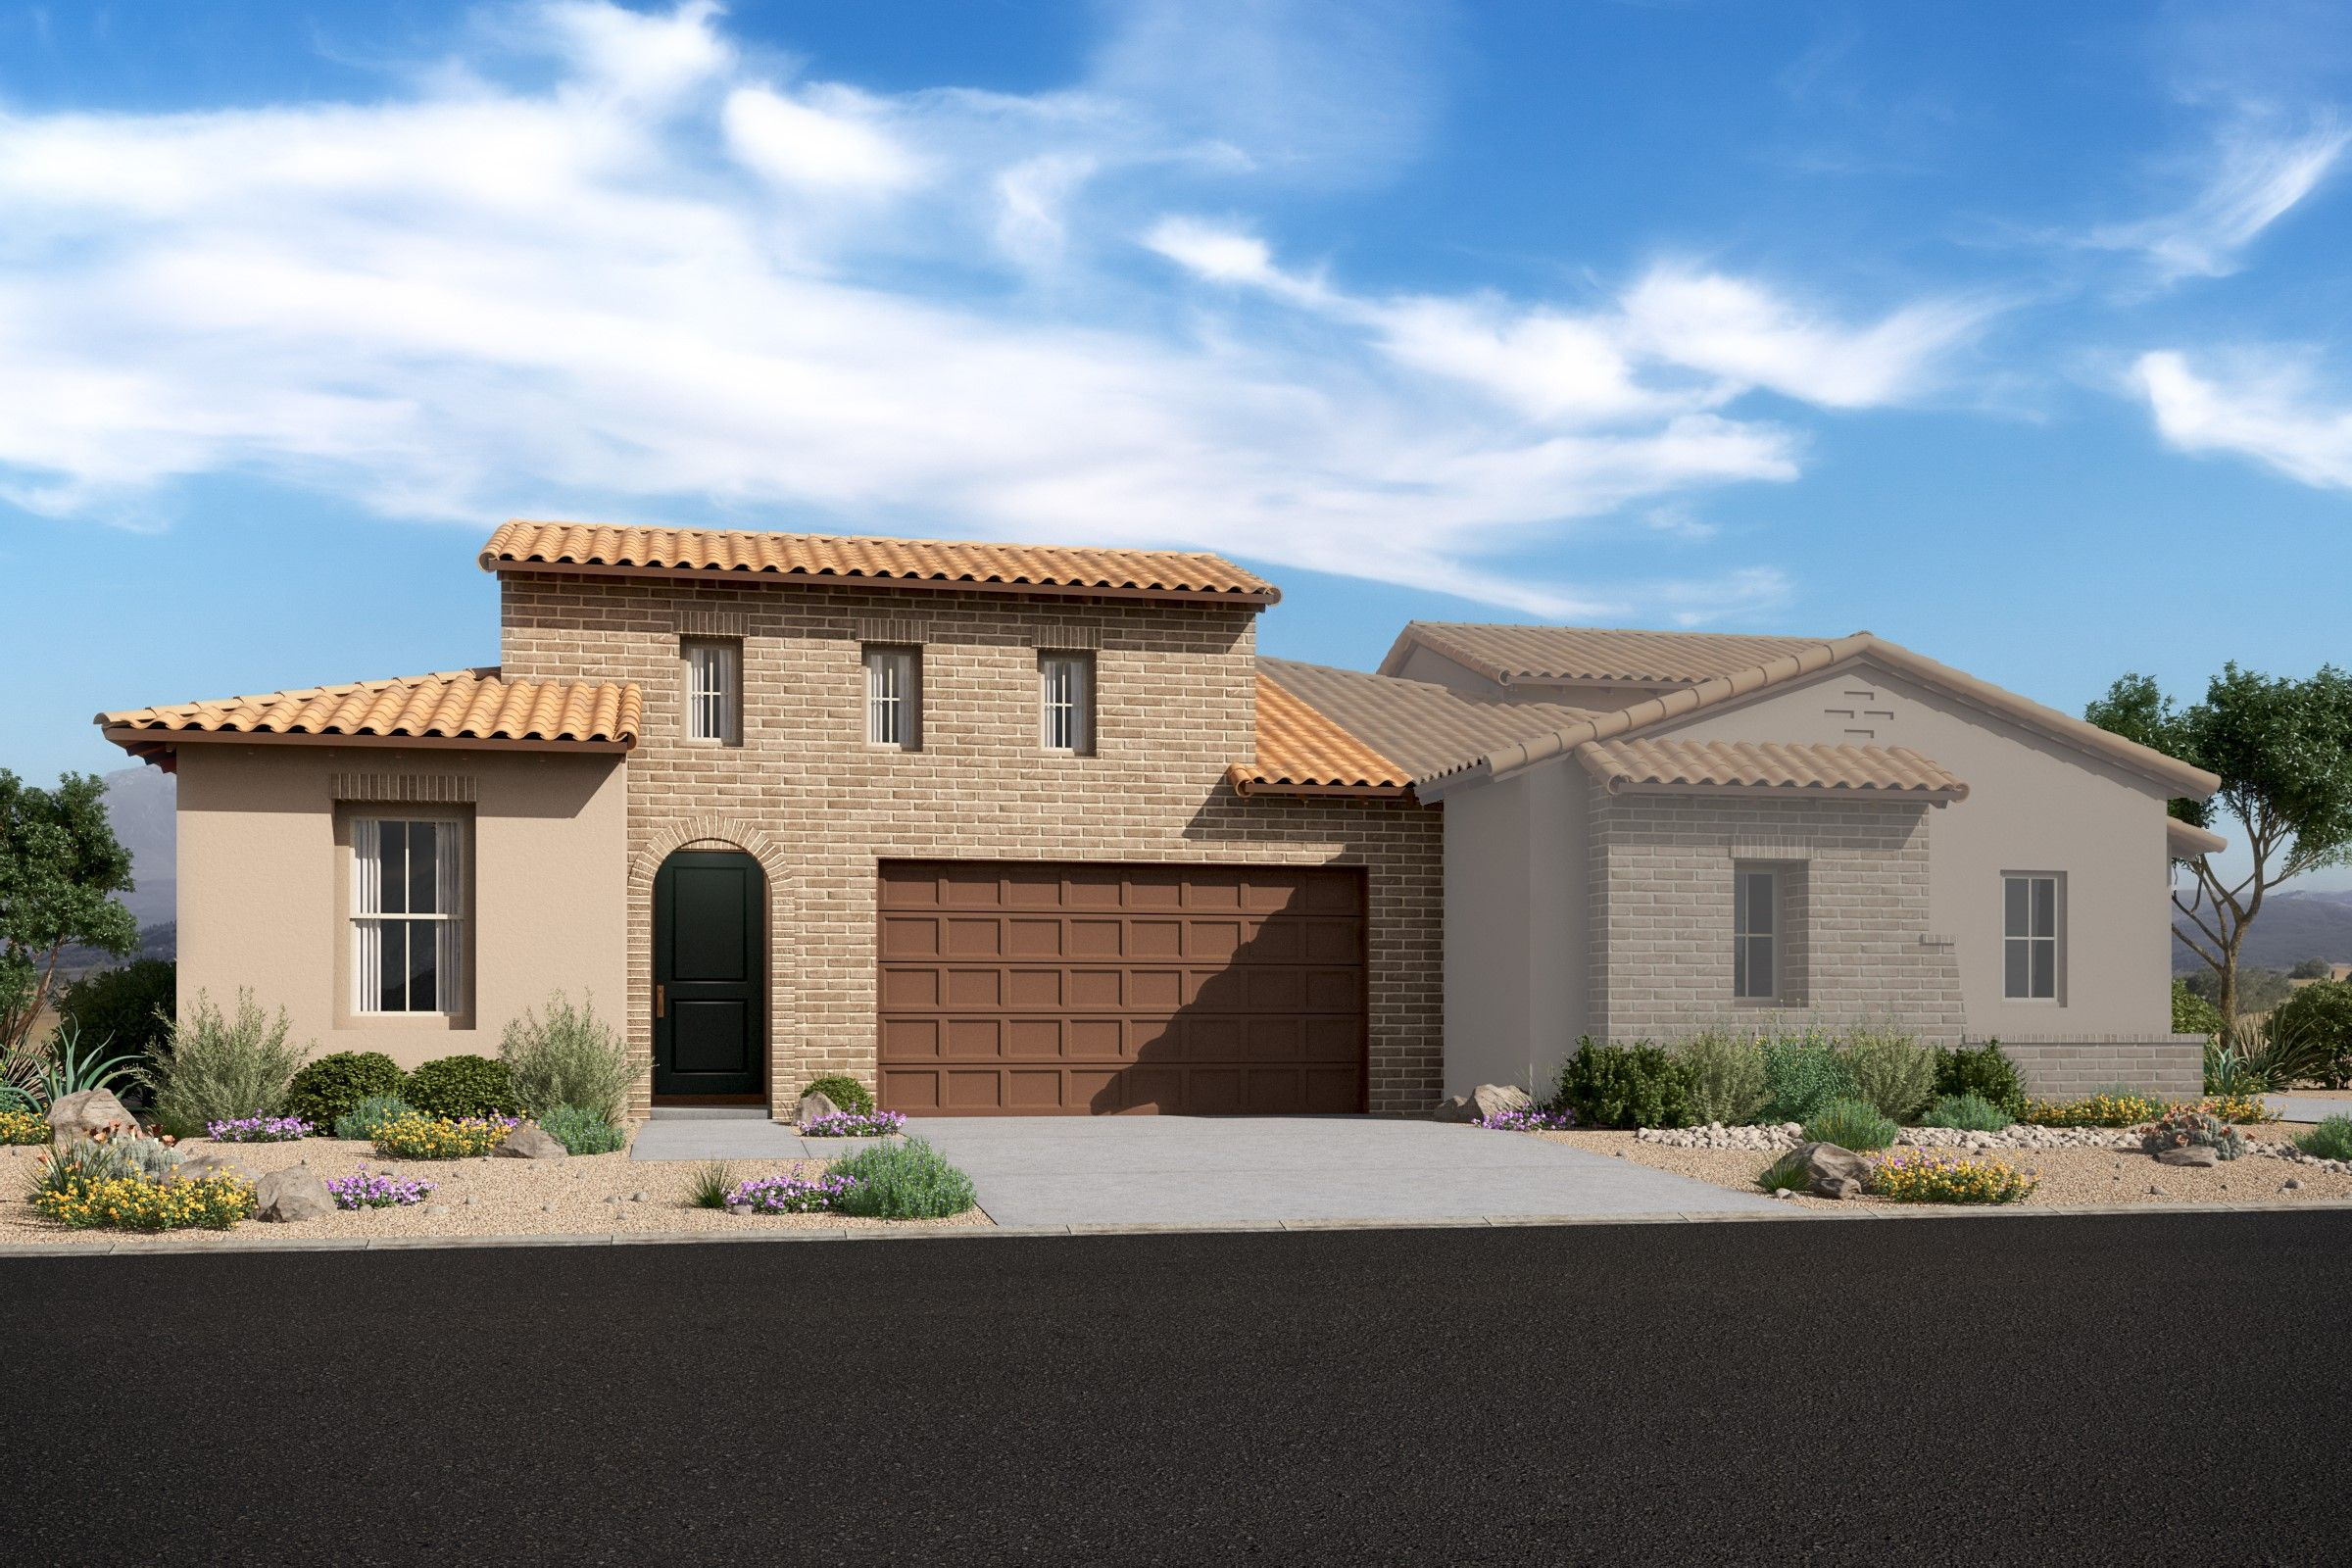 Multi Family for Sale at Summit At Pinnacle Peak Patio - Capstone 10424 East Jomax Road Scottsdale, Arizona 85262 United States